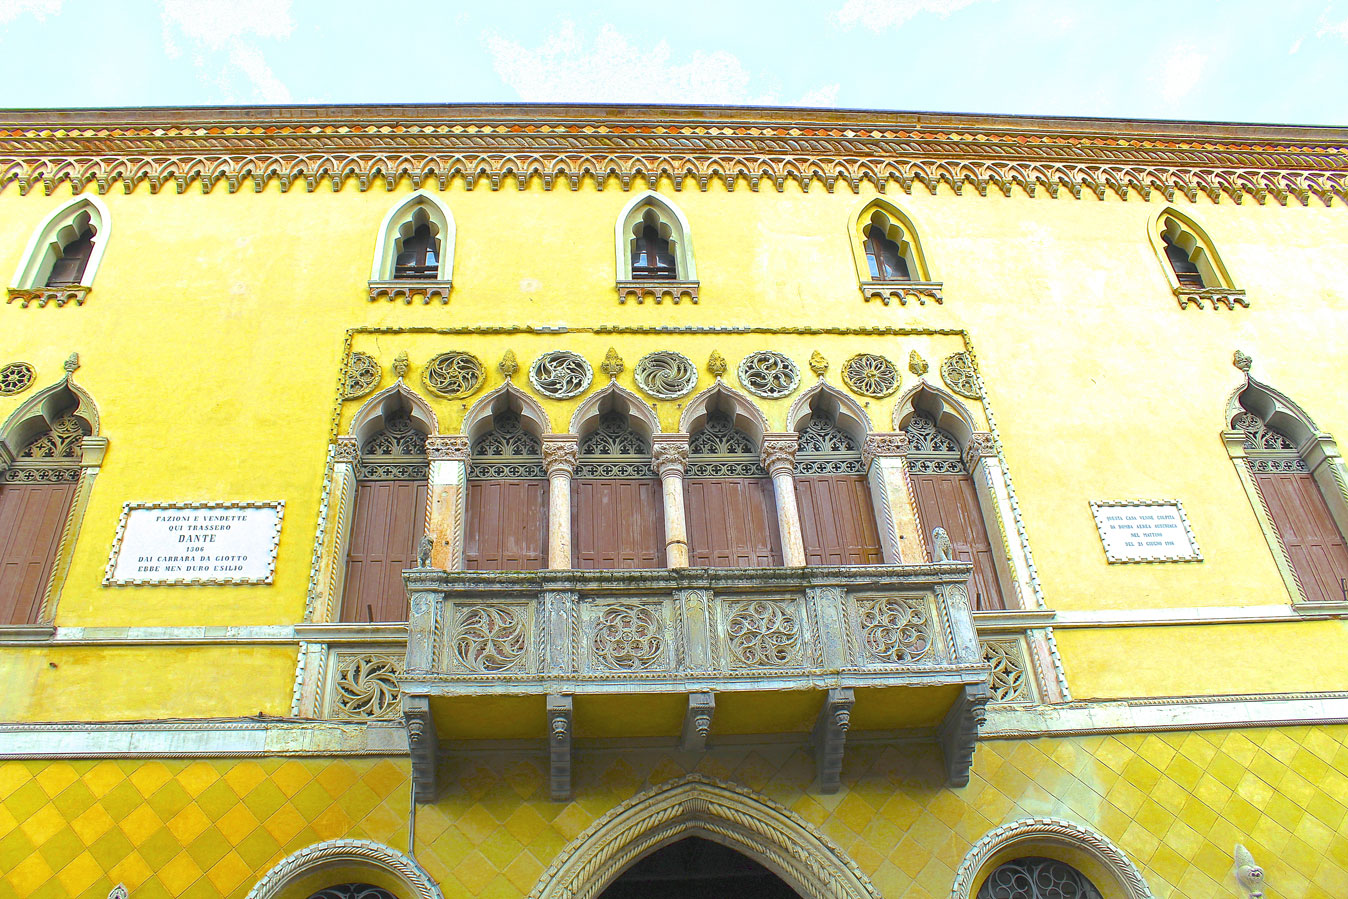 Things-to-do-in-Padua-Balconies 3